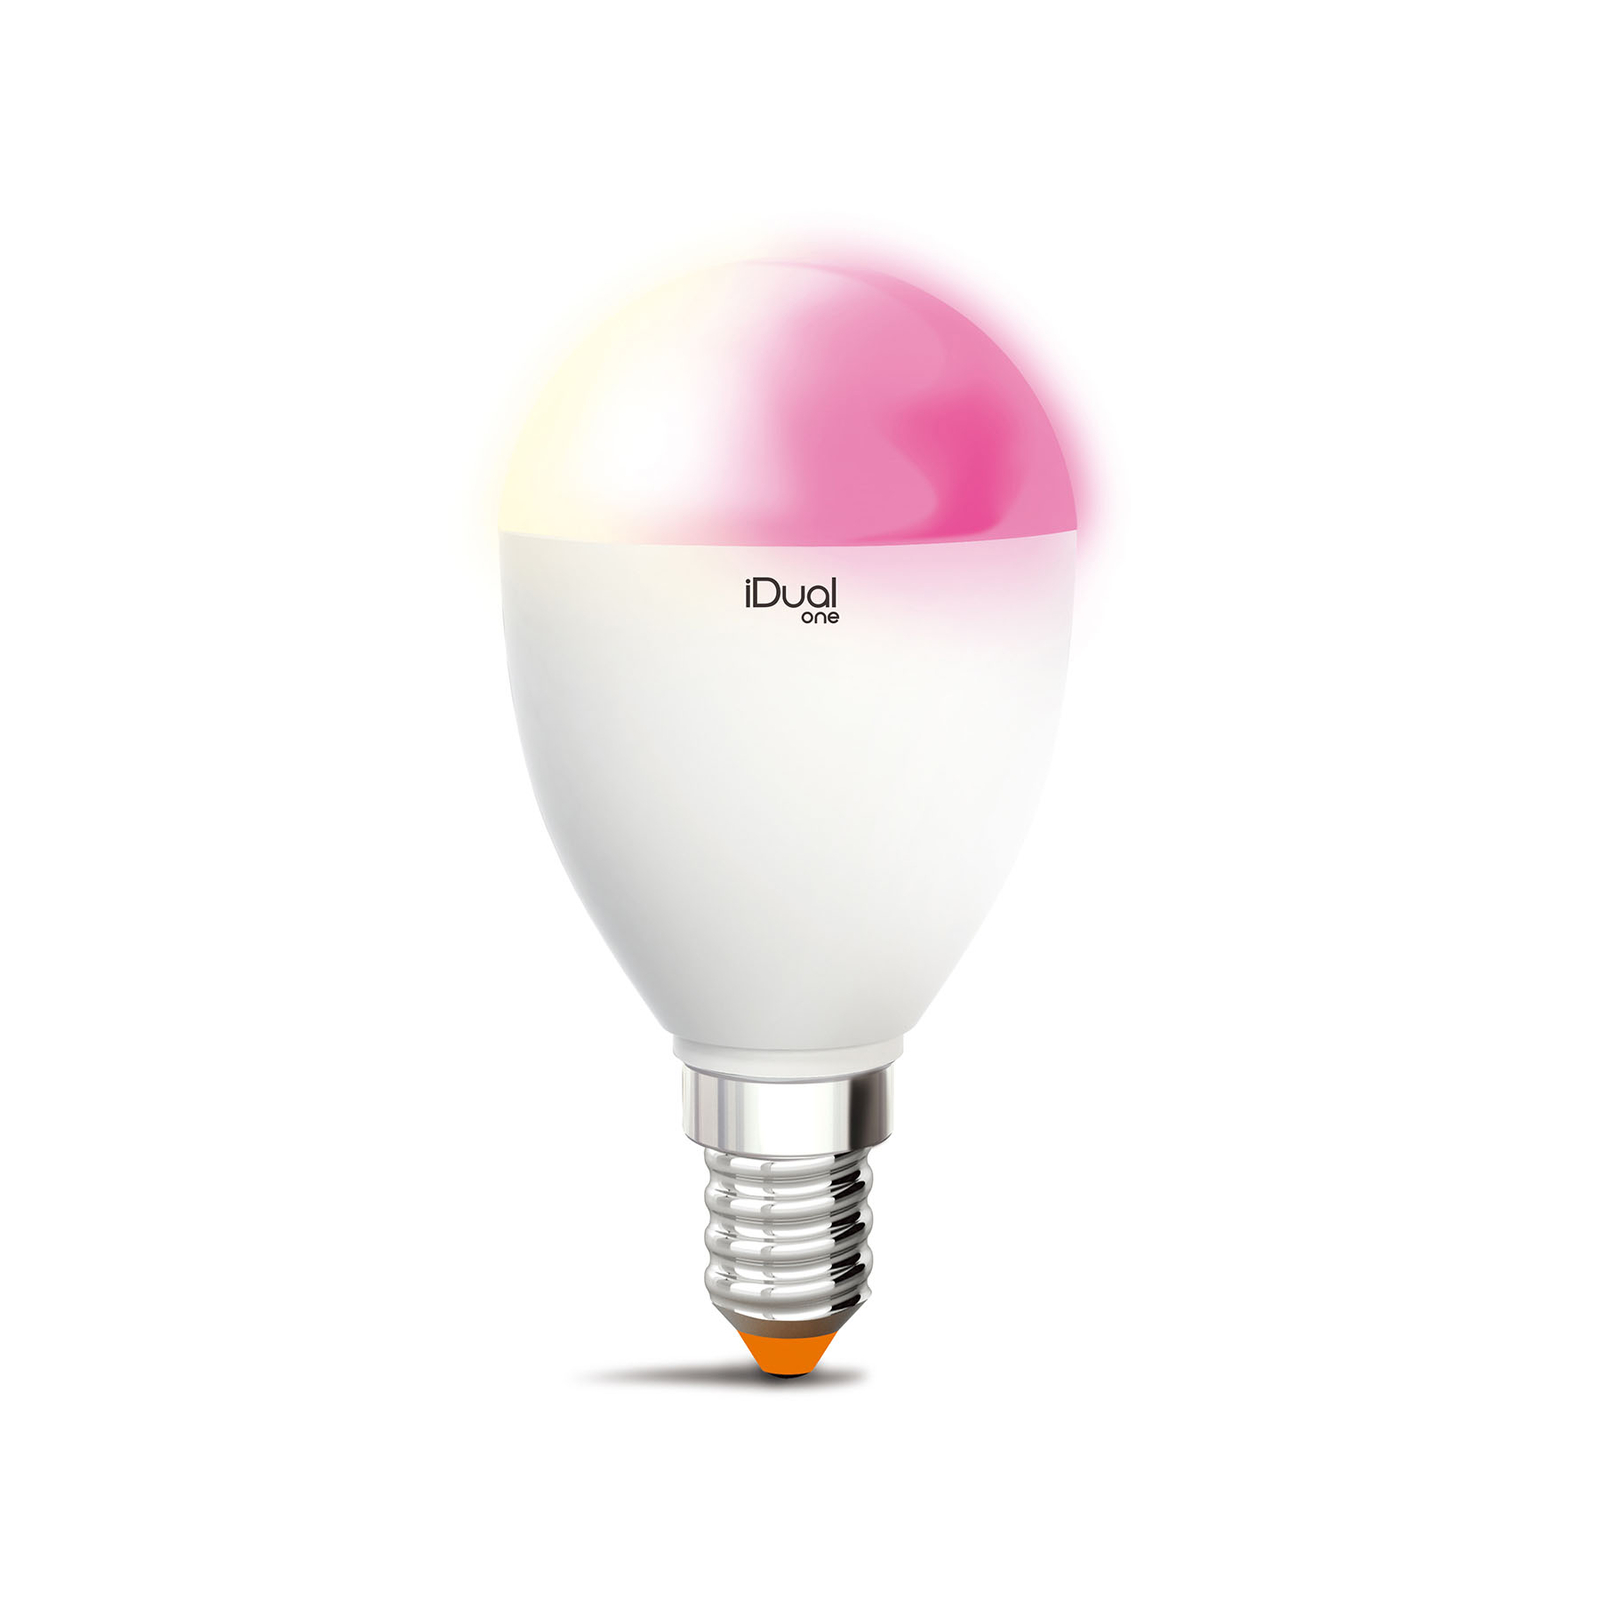 iDual One ampoule flamme LED E14 5,3W 400lm RGBW